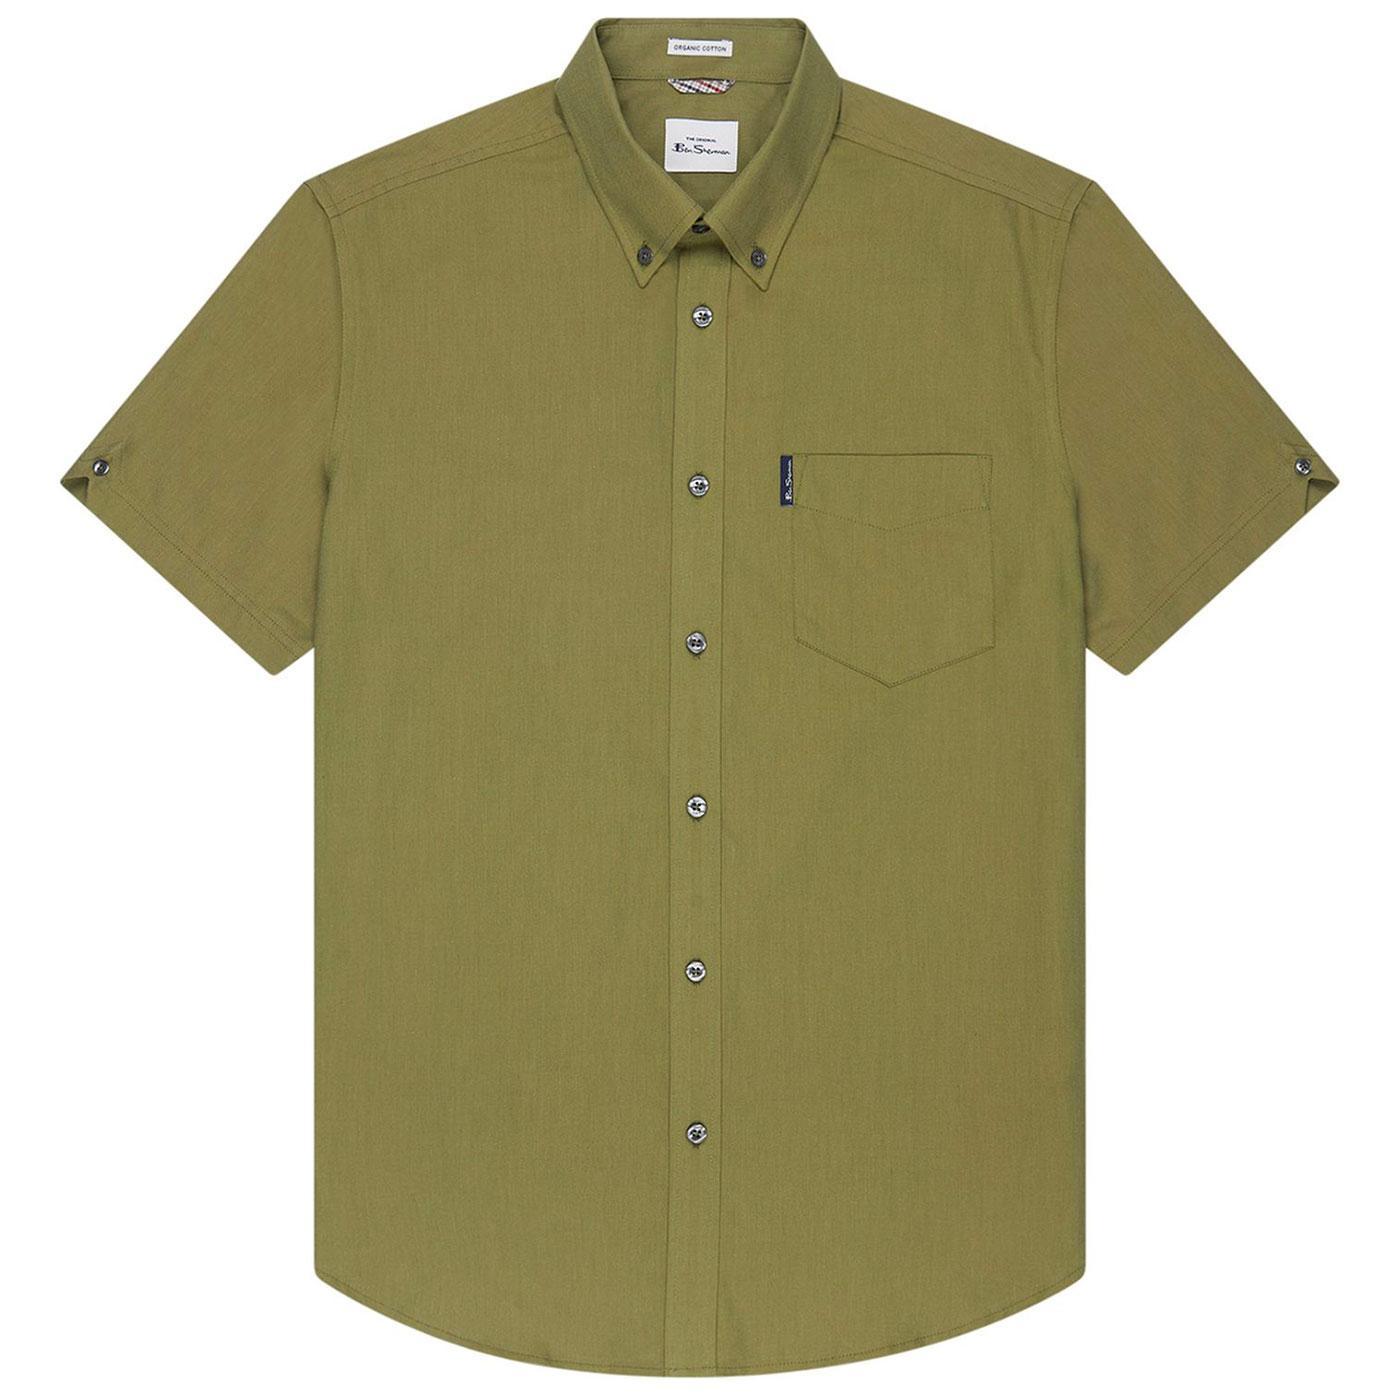 BEN SHERMAN Retro Short Sleeve Oxford Shirt -Olive